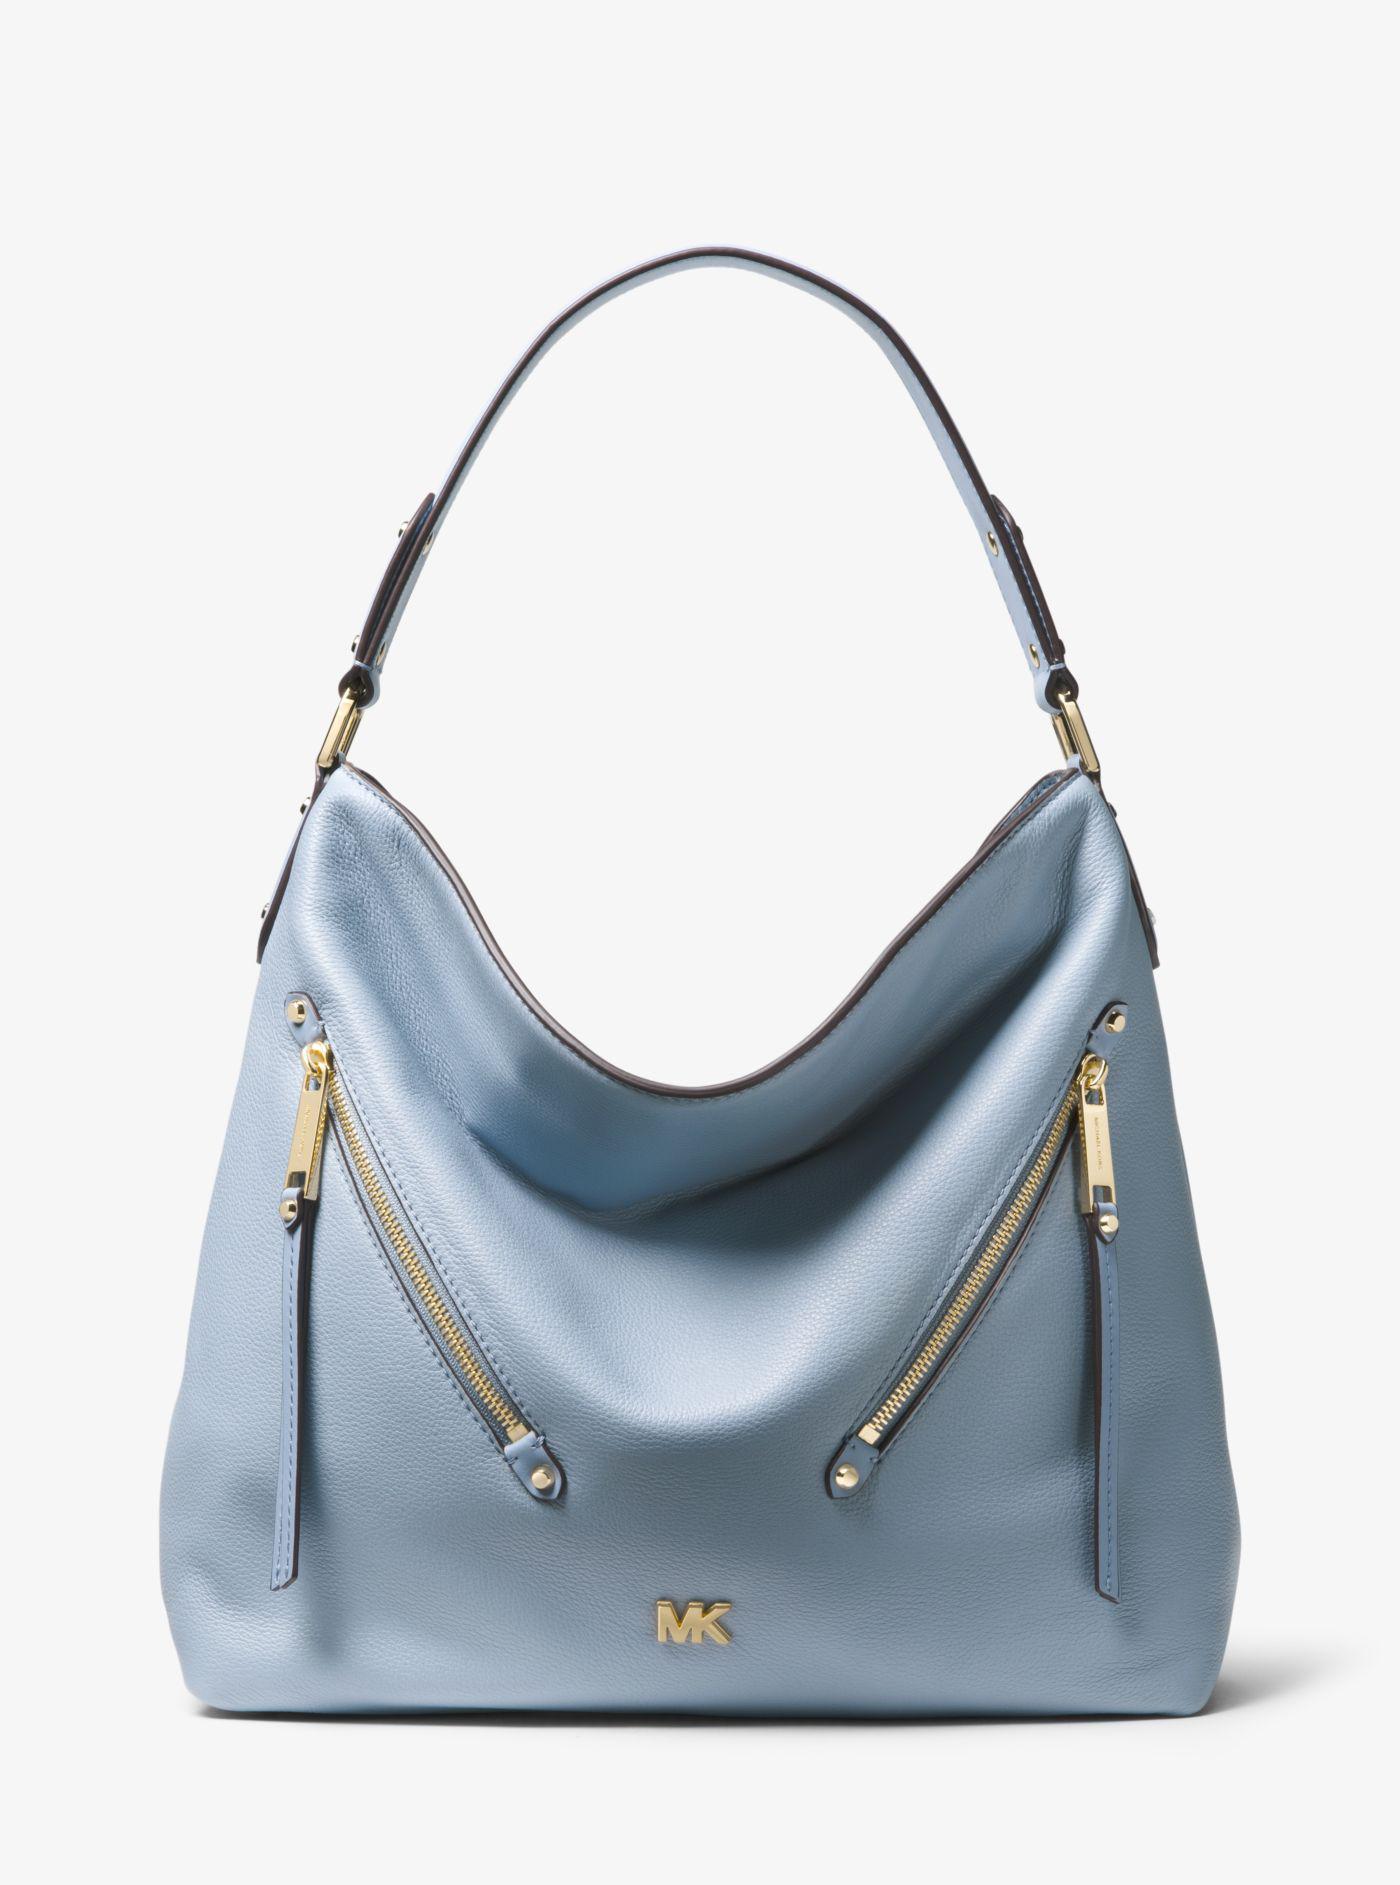 9bef21586fa7 Michael Kors Evie Large Pebbled Leather Shoulder Bag in Blue - Lyst